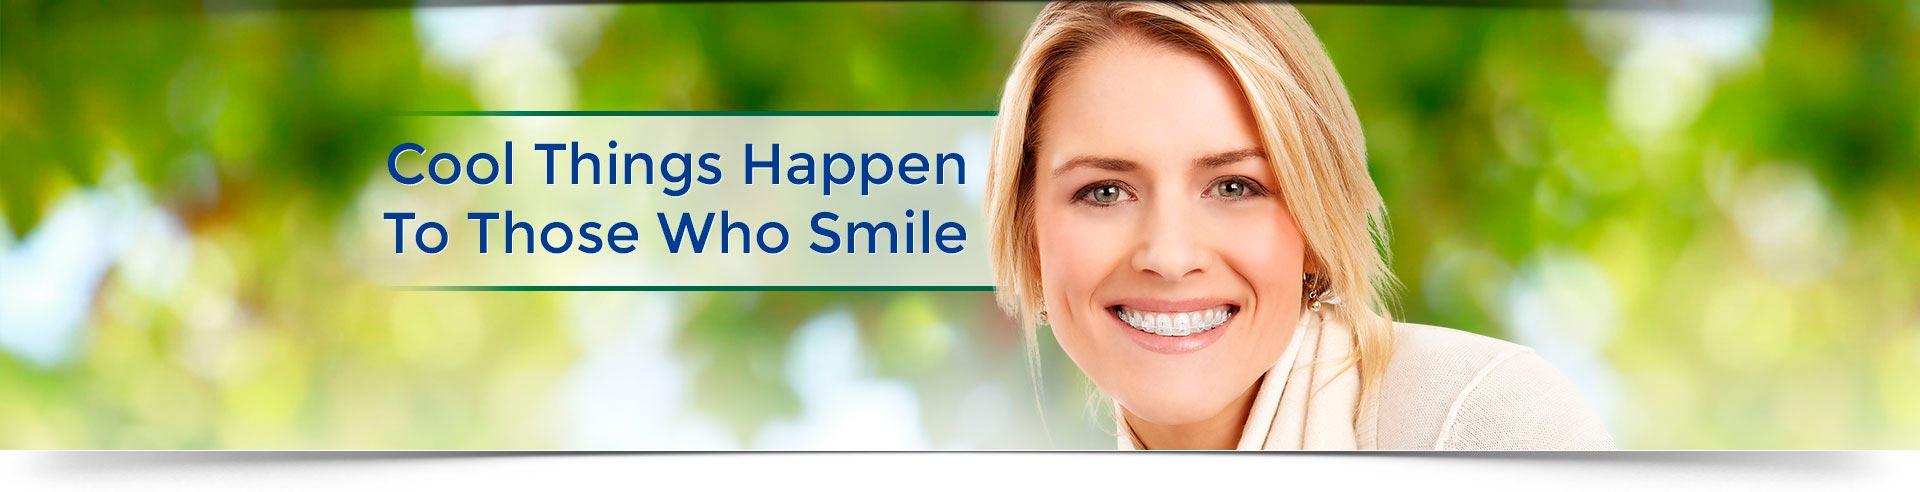 CoolSmiles-Orthodontics-Medford-Port-Jefferson-NY-Happy-Smiling-Woman-1920